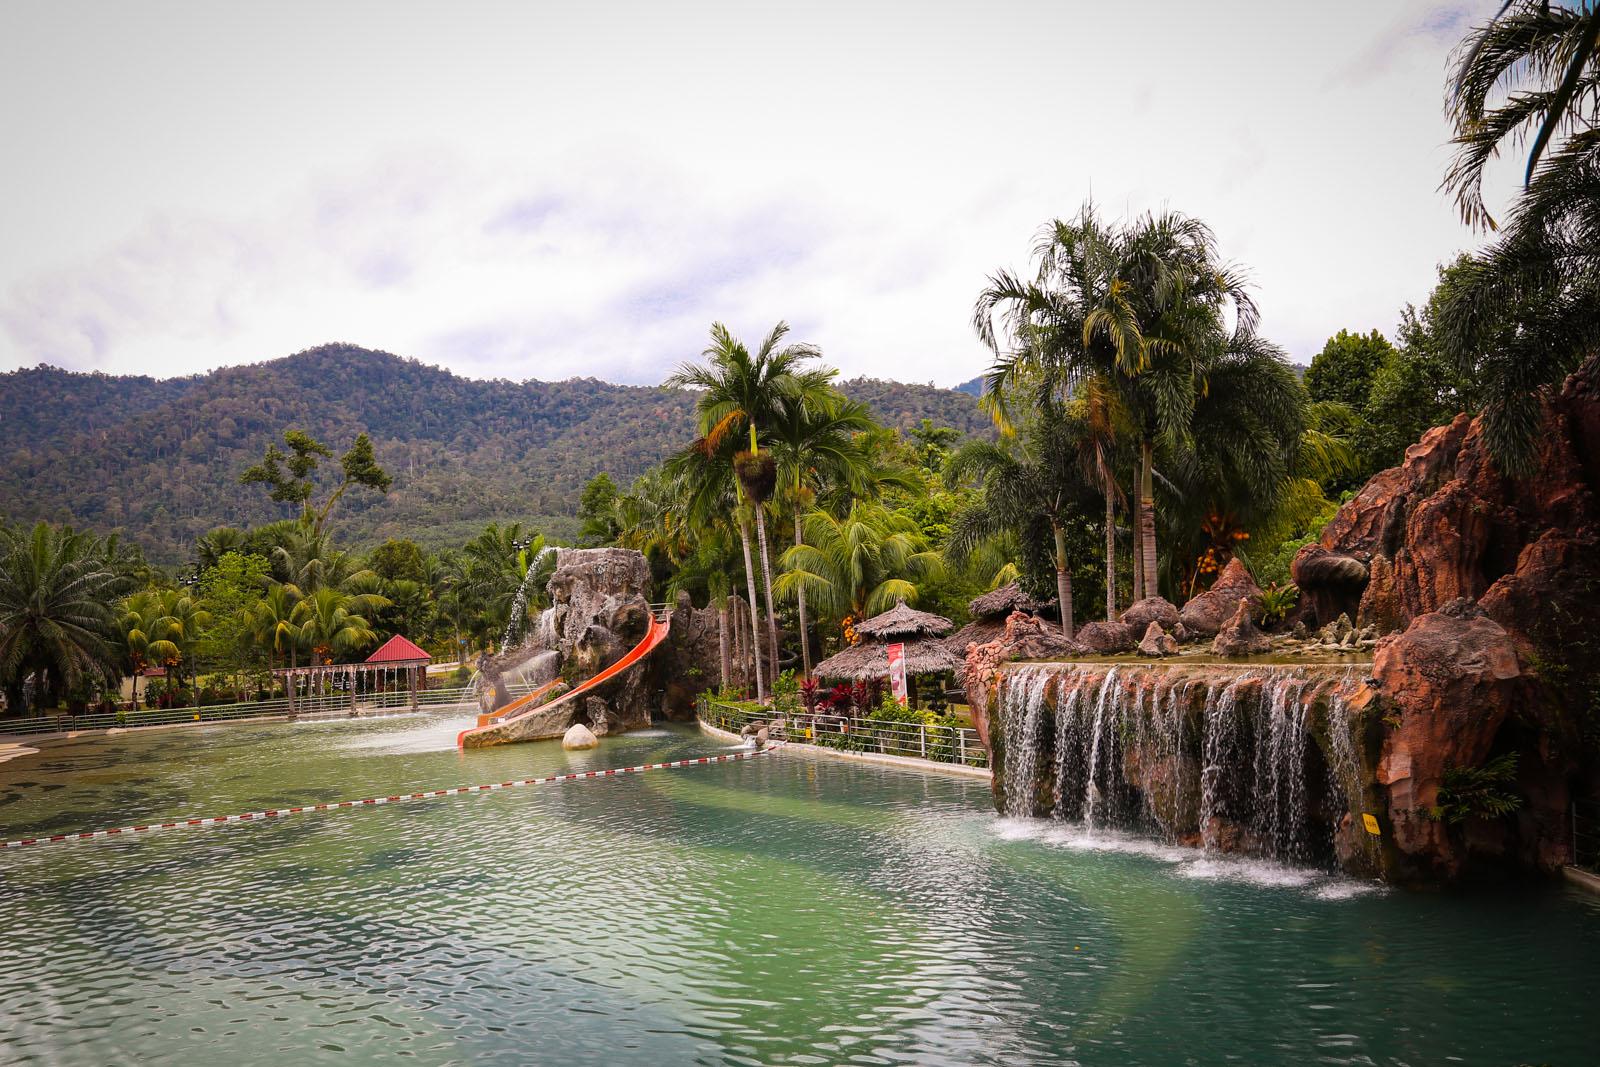 Sungai klah hot springs - Sungai Klah Hot Springs 5